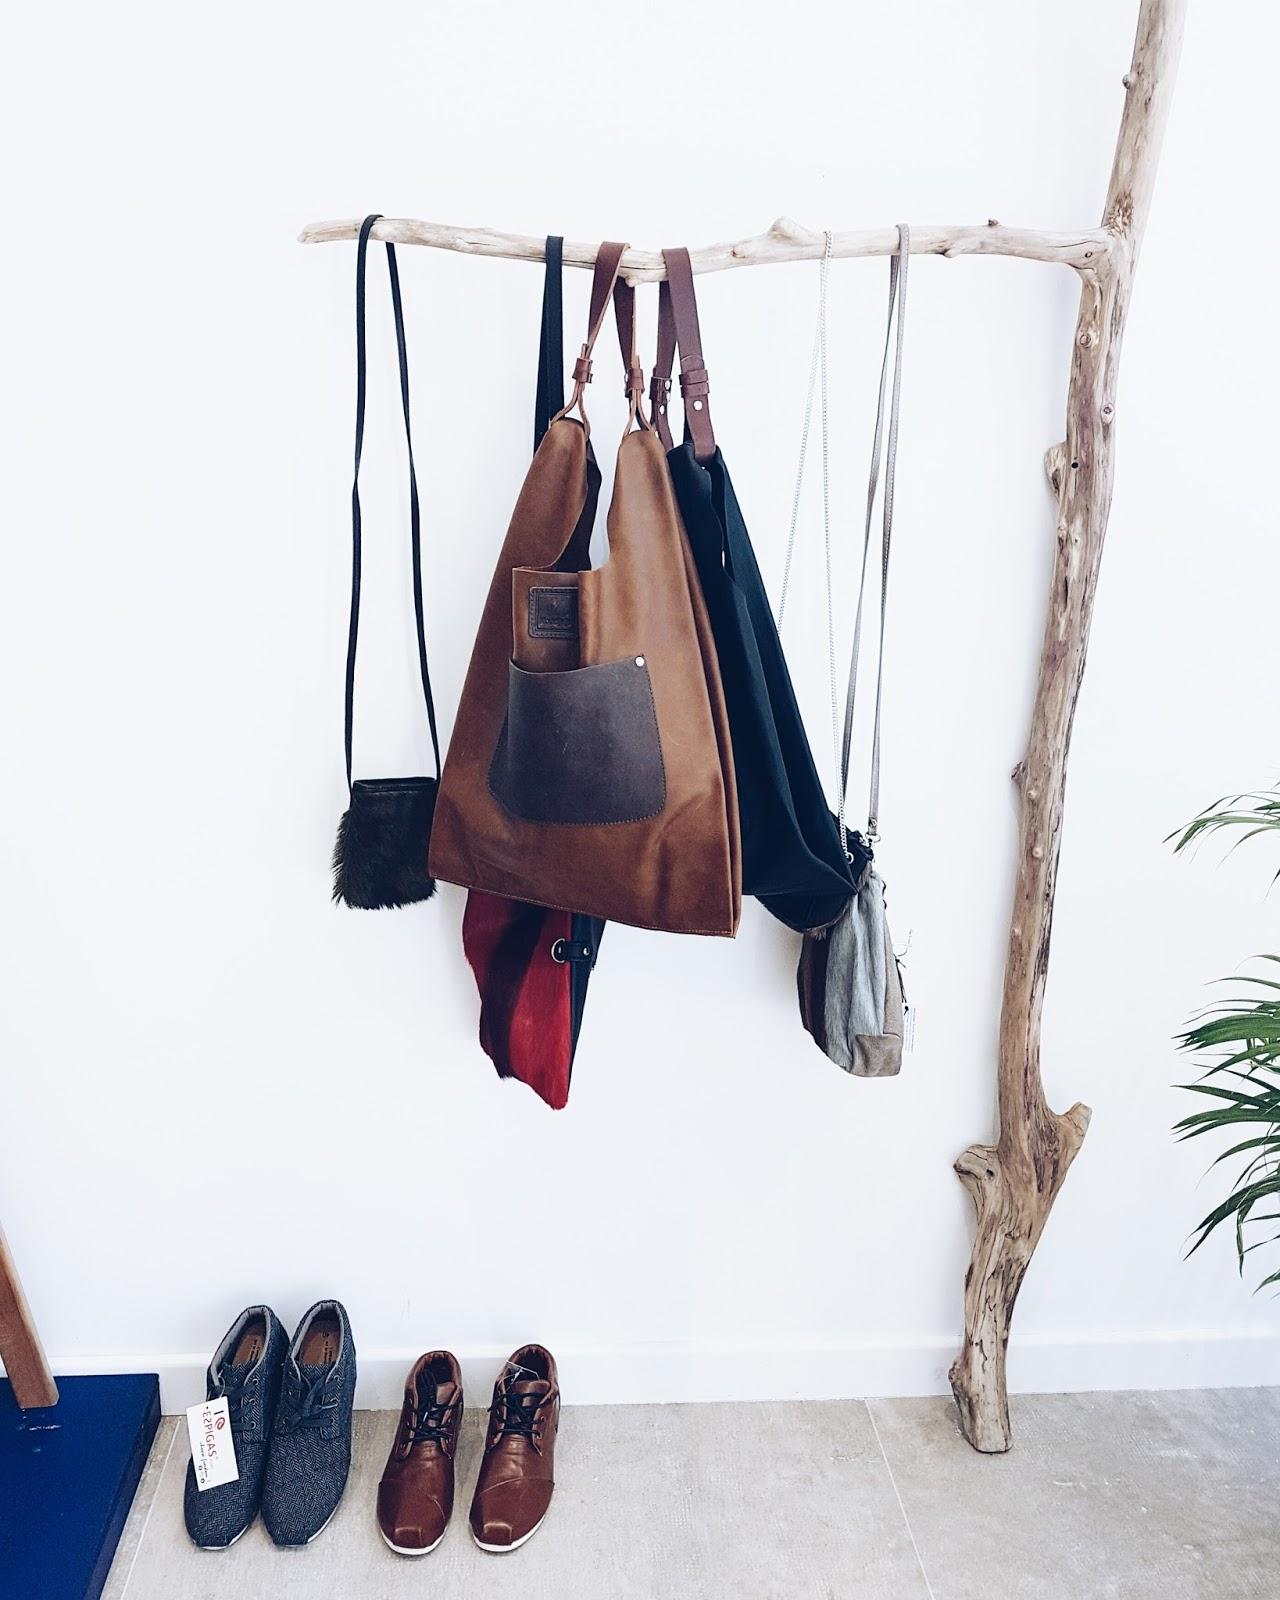 avis_village_des_marques_miramas_boutiques_prix_mama_syca_beaute